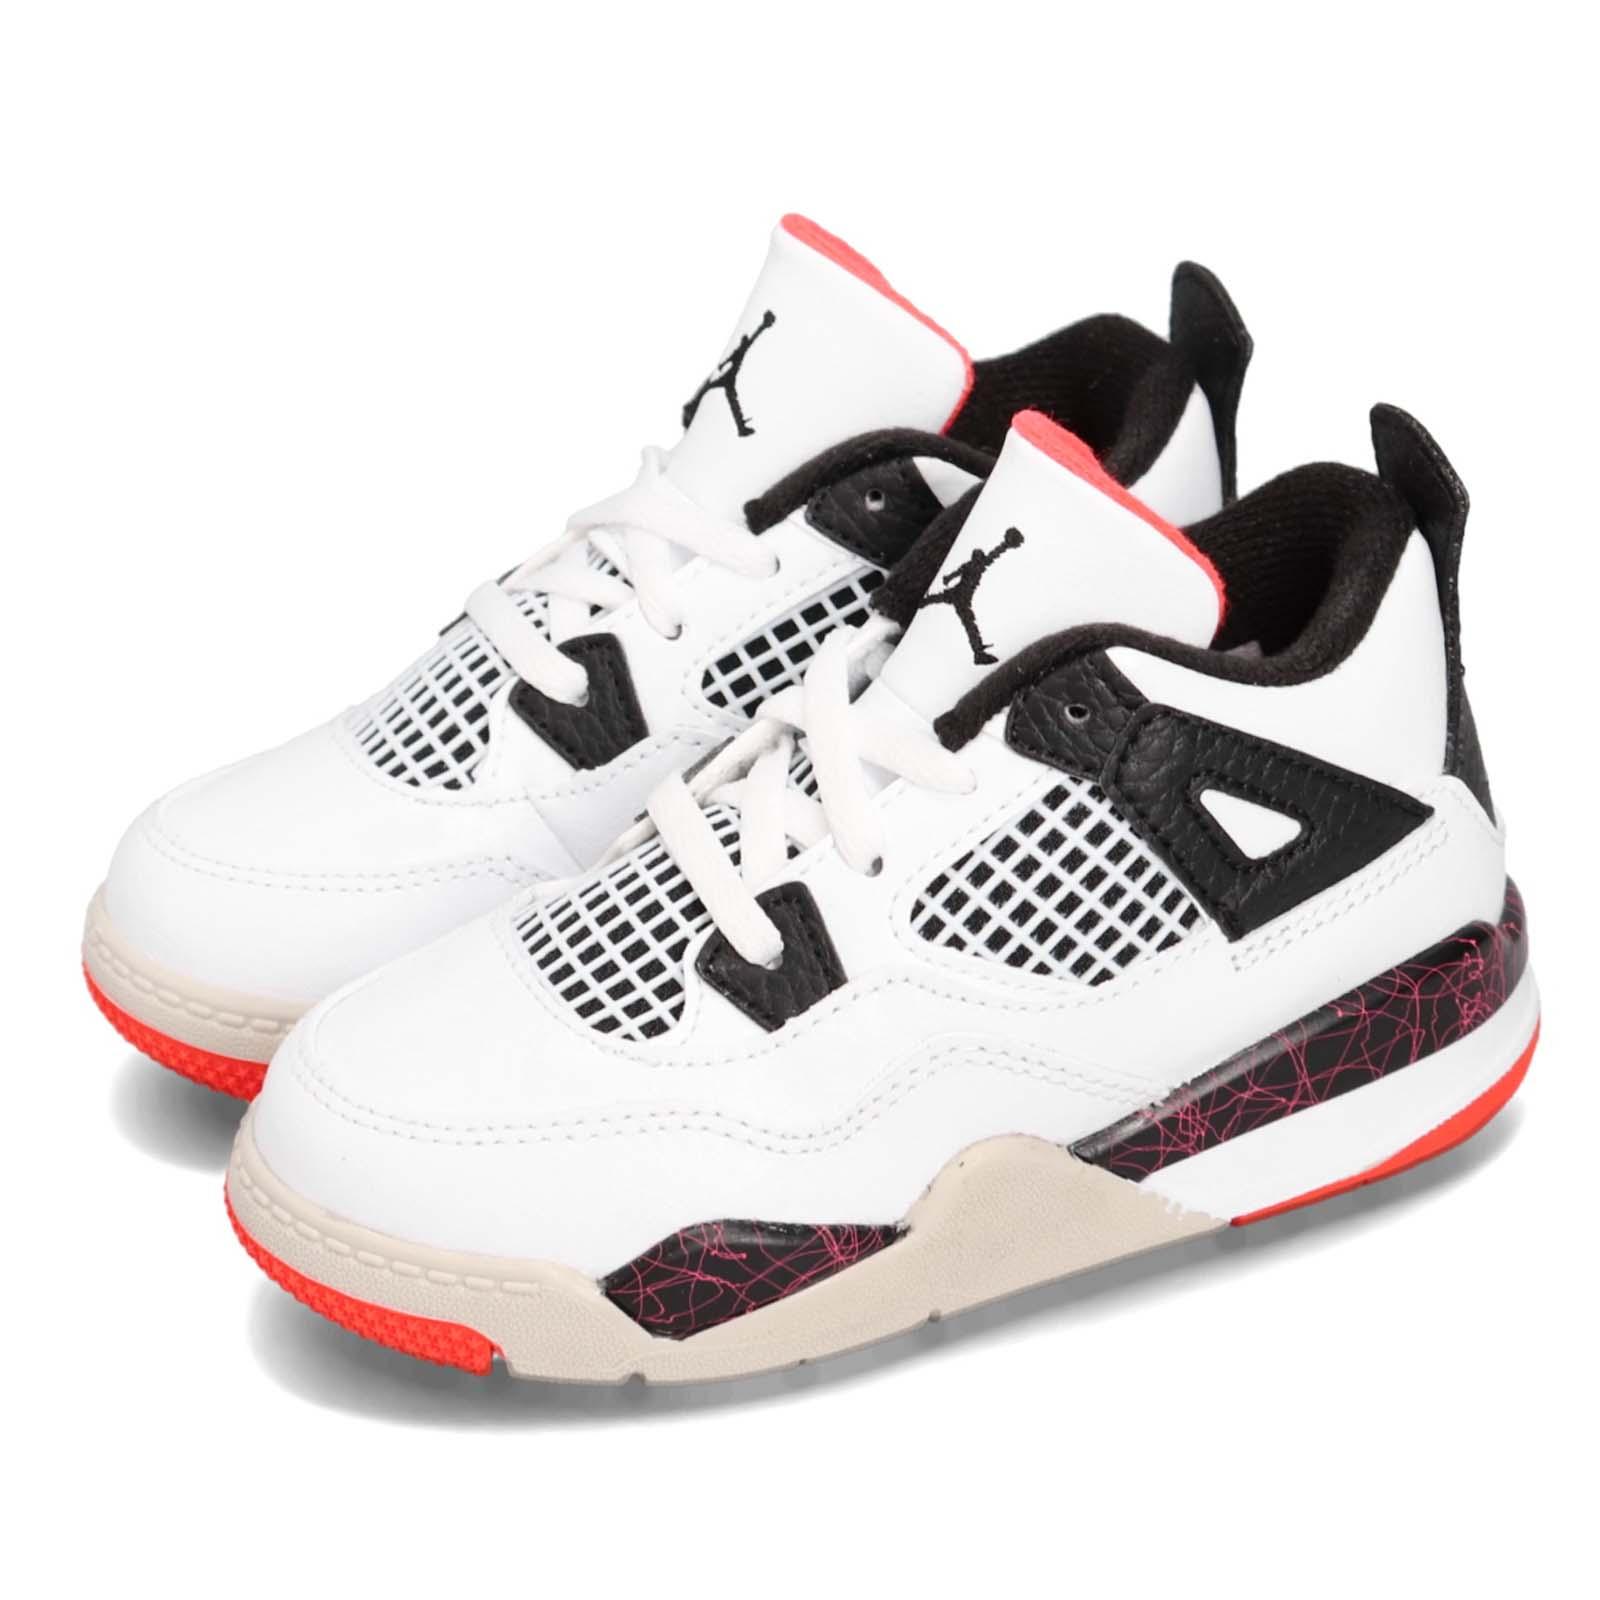 Nike 籃球鞋 Jordan 4 Retro 童鞋 BQ7670-116